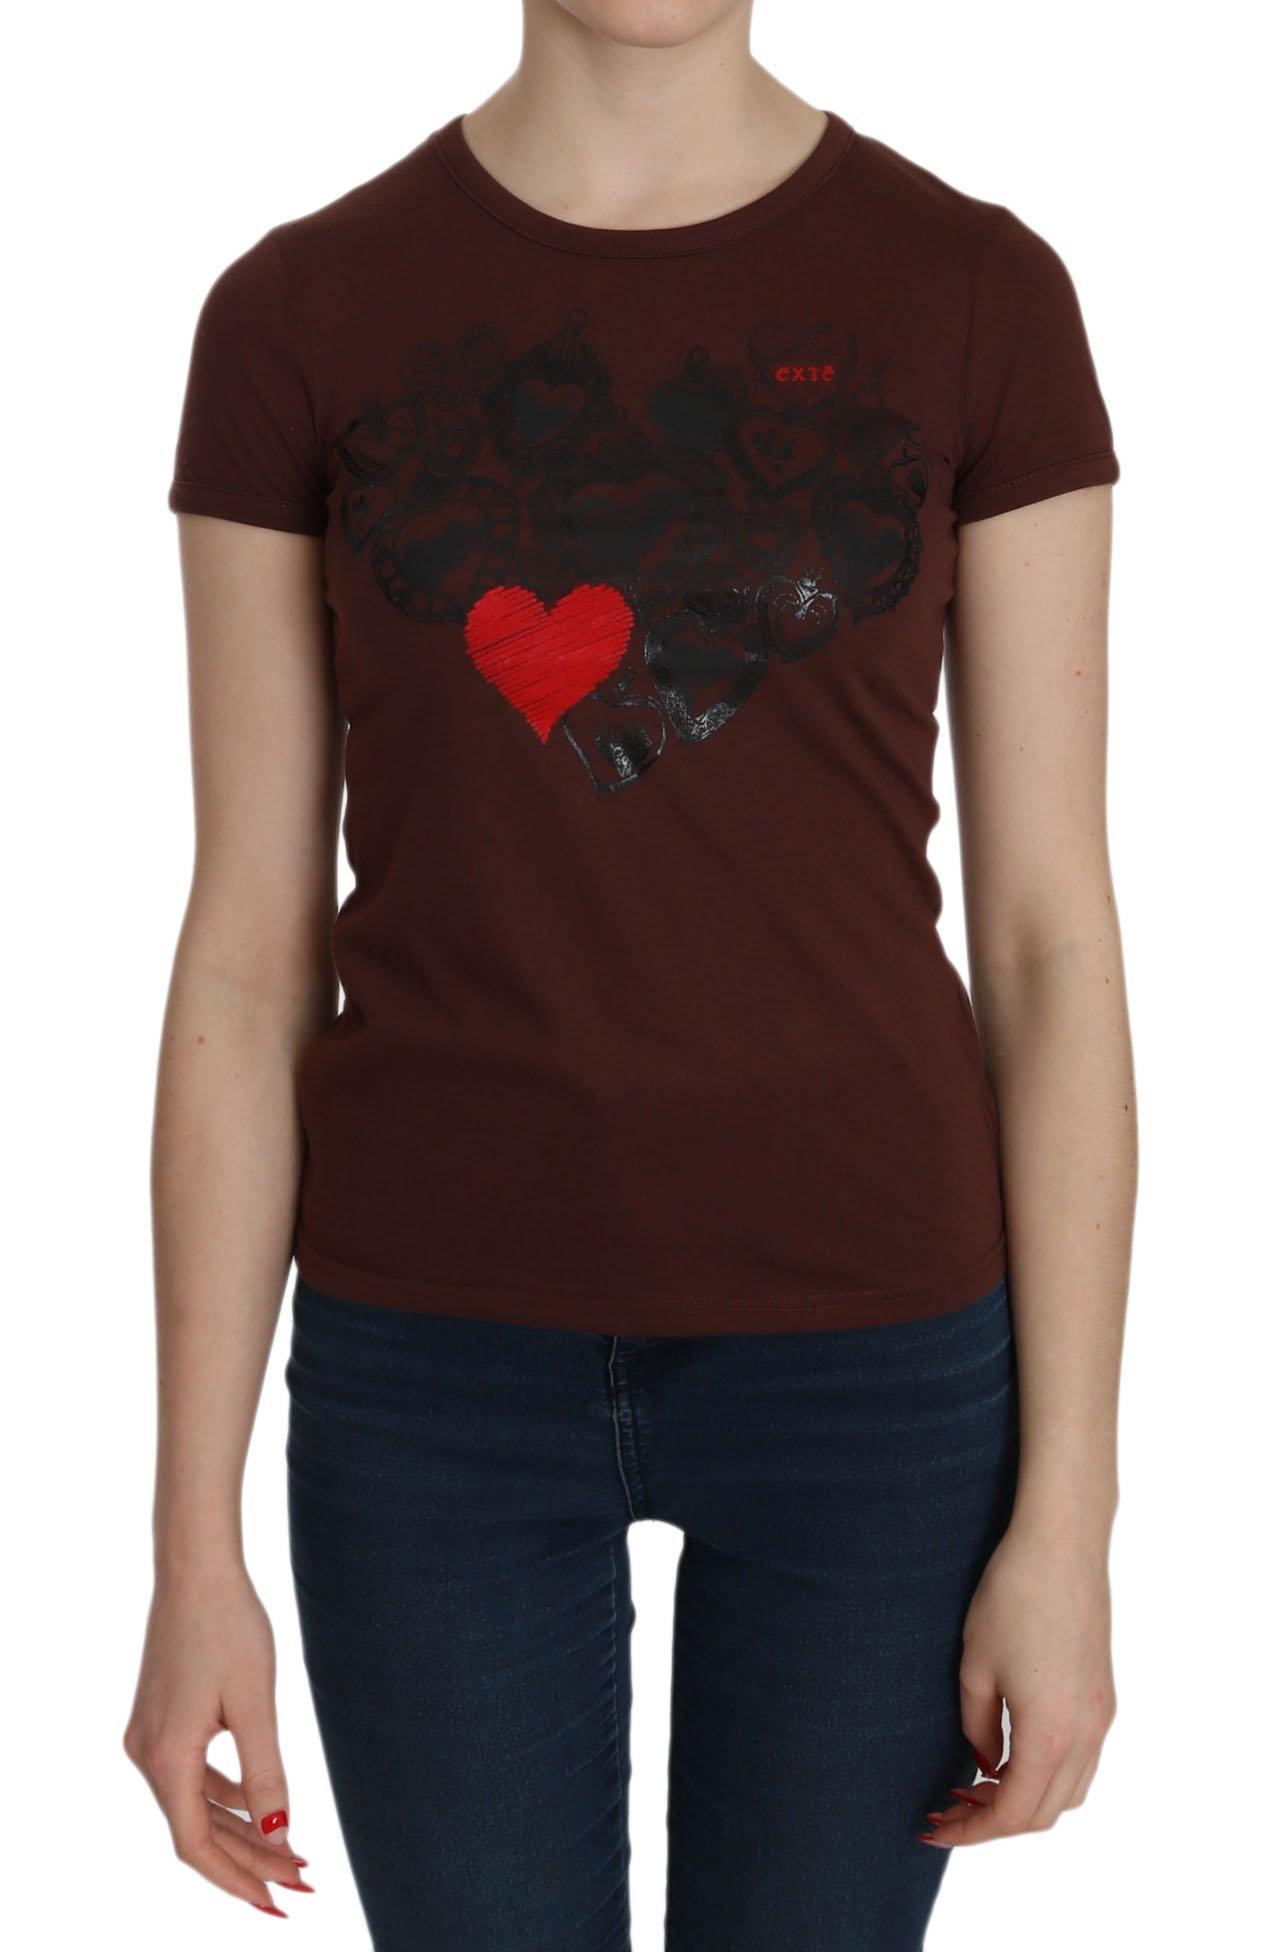 Exte Women's Heart Print Crew Neck T-shirt SS Top Brown TSH3716 - IT42 M